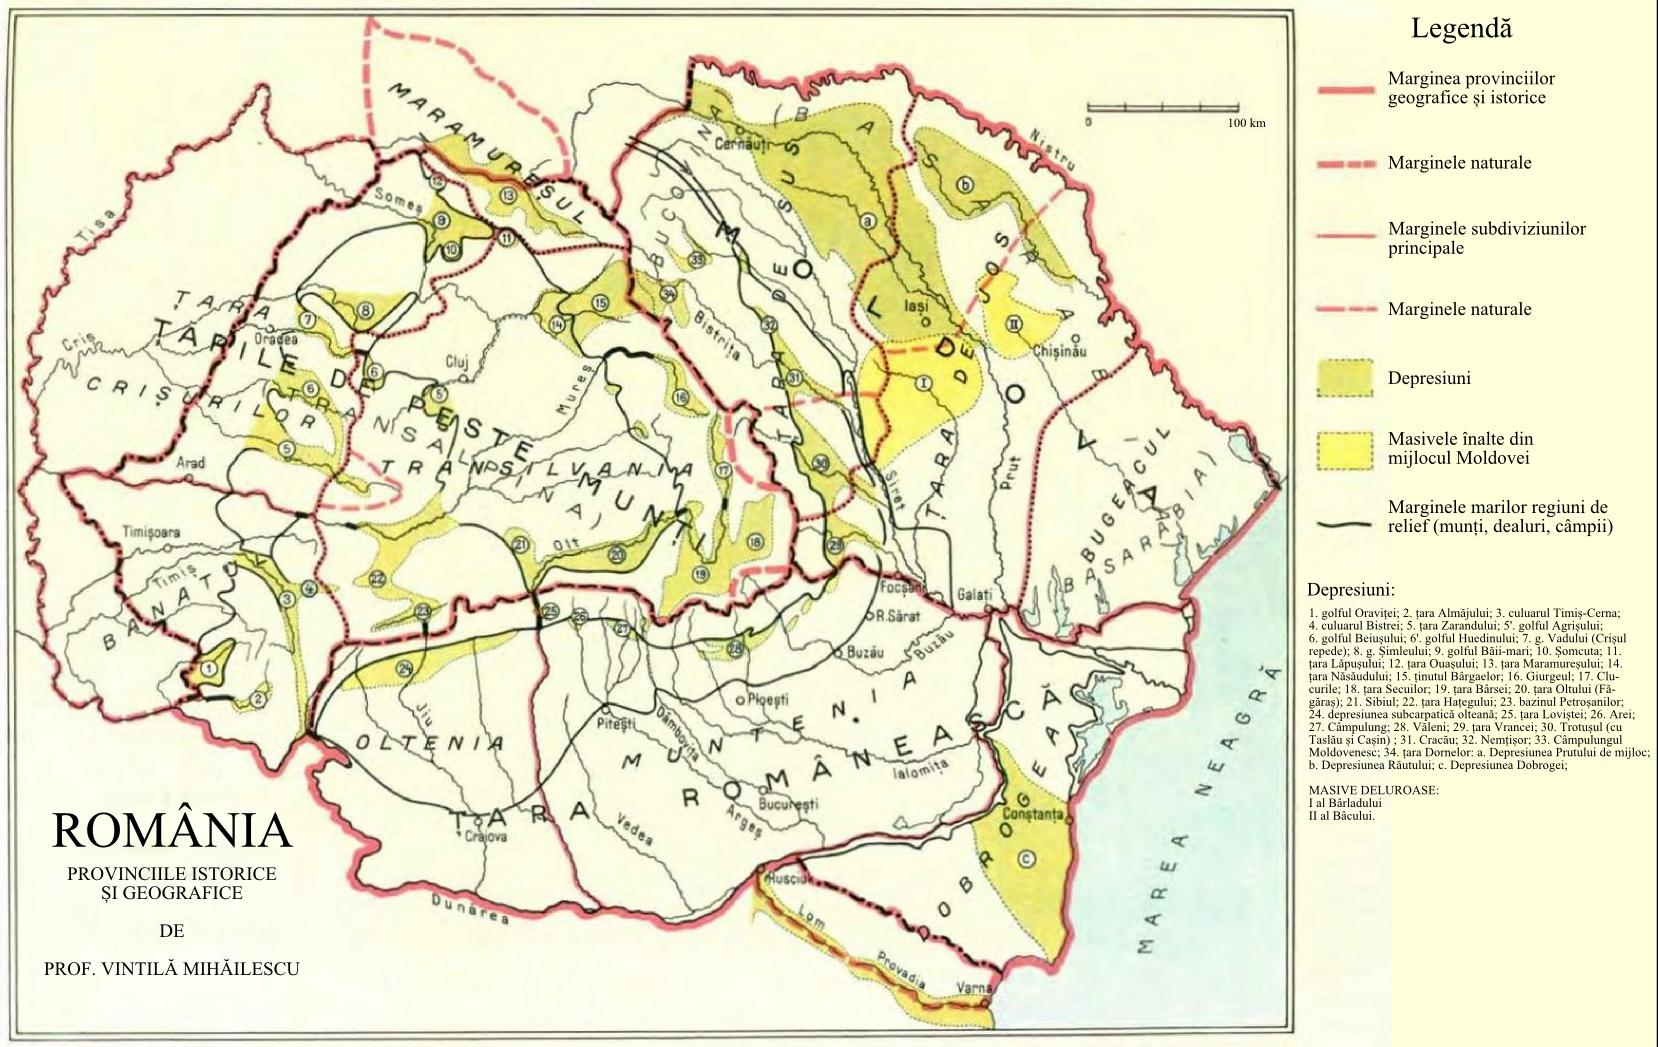 File Romania Harta Provinciilor Geografice Si Istorice Jpg